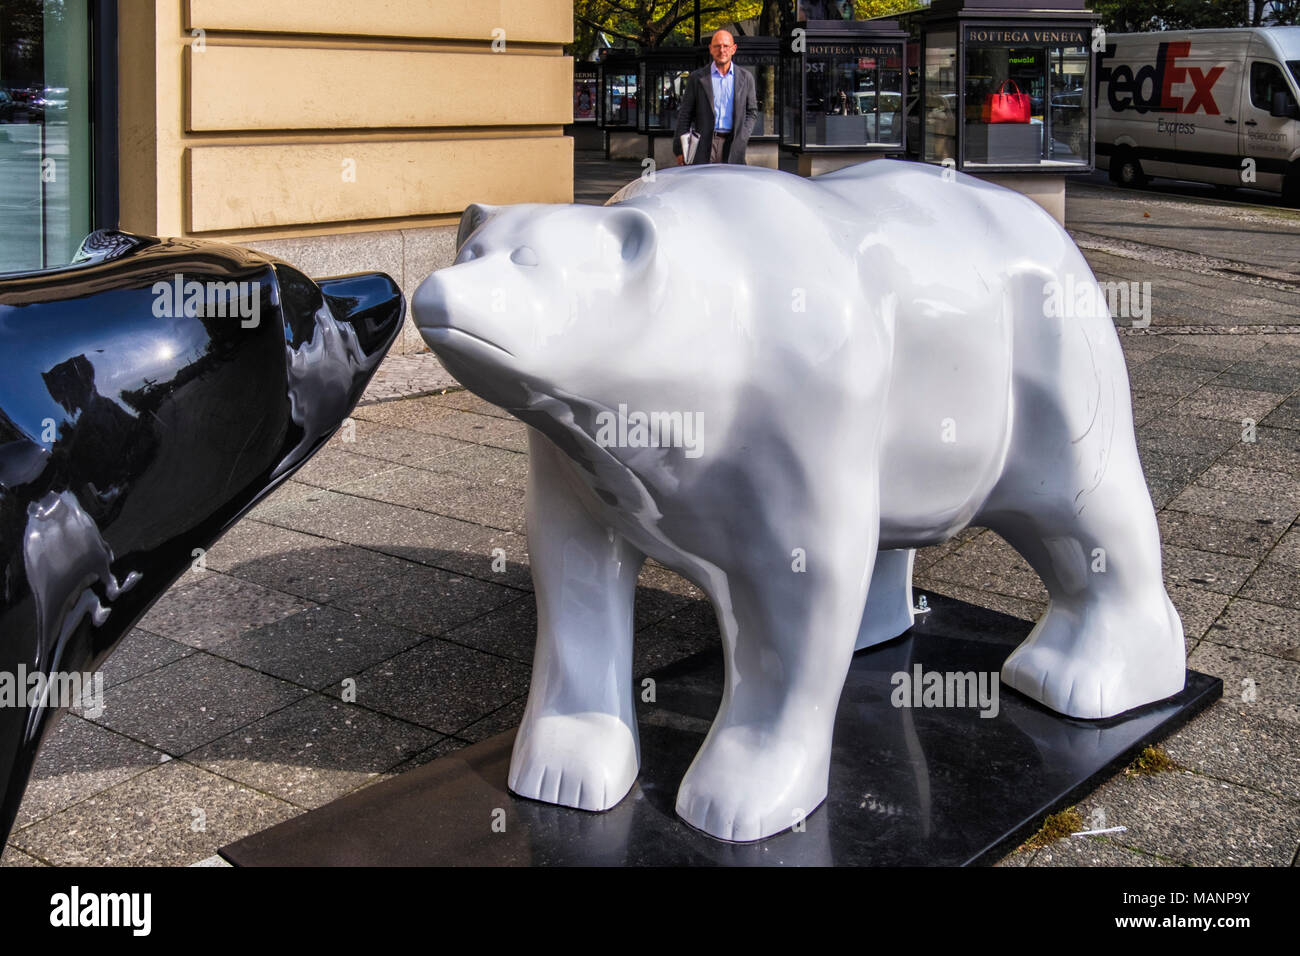 Berlin, Charlottenburg. Black & white Buddy bears designed by Ricky Racoon. Fibre-glass heraldic bear sculpture is Berlin emblem. 2 bears nose to nose - Stock Image